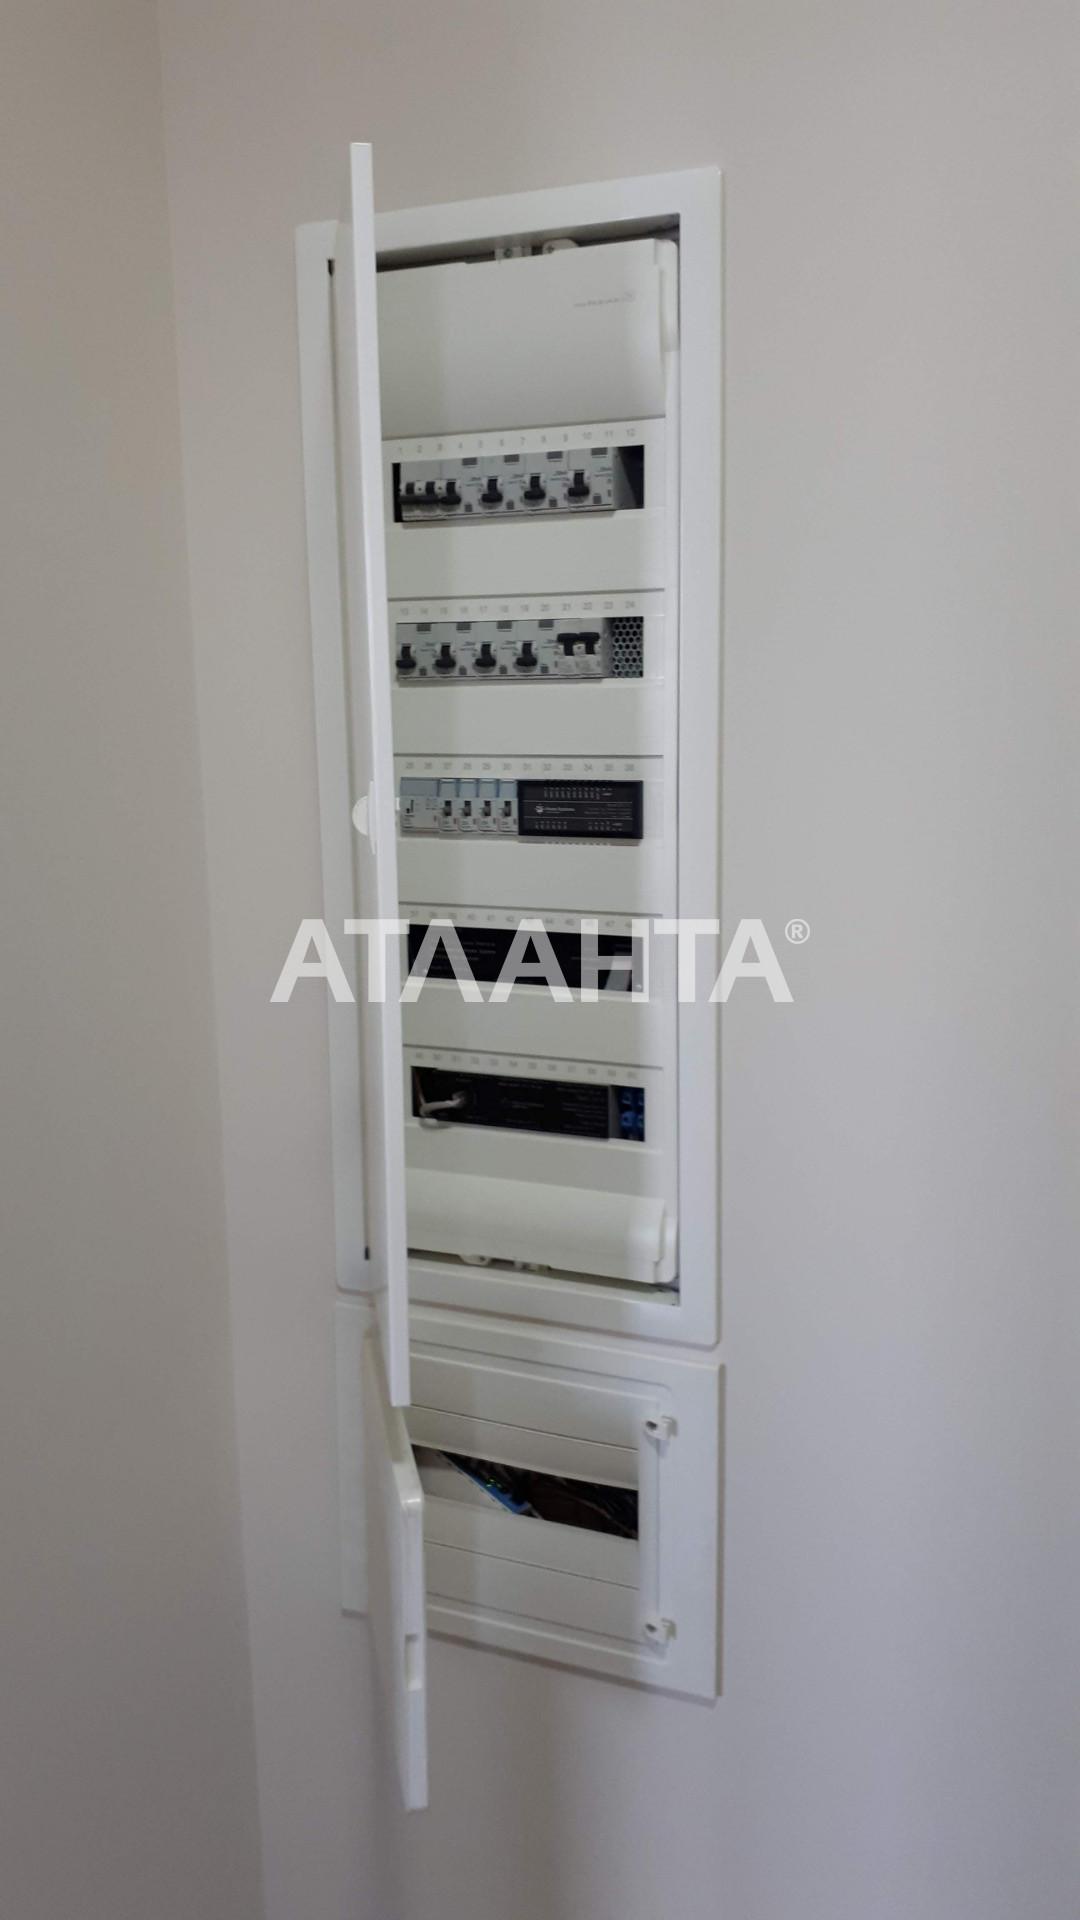 Продается 2-комнатная Квартира на ул. Ул. Академика Вильямса — 60 000 у.е. (фото №4)